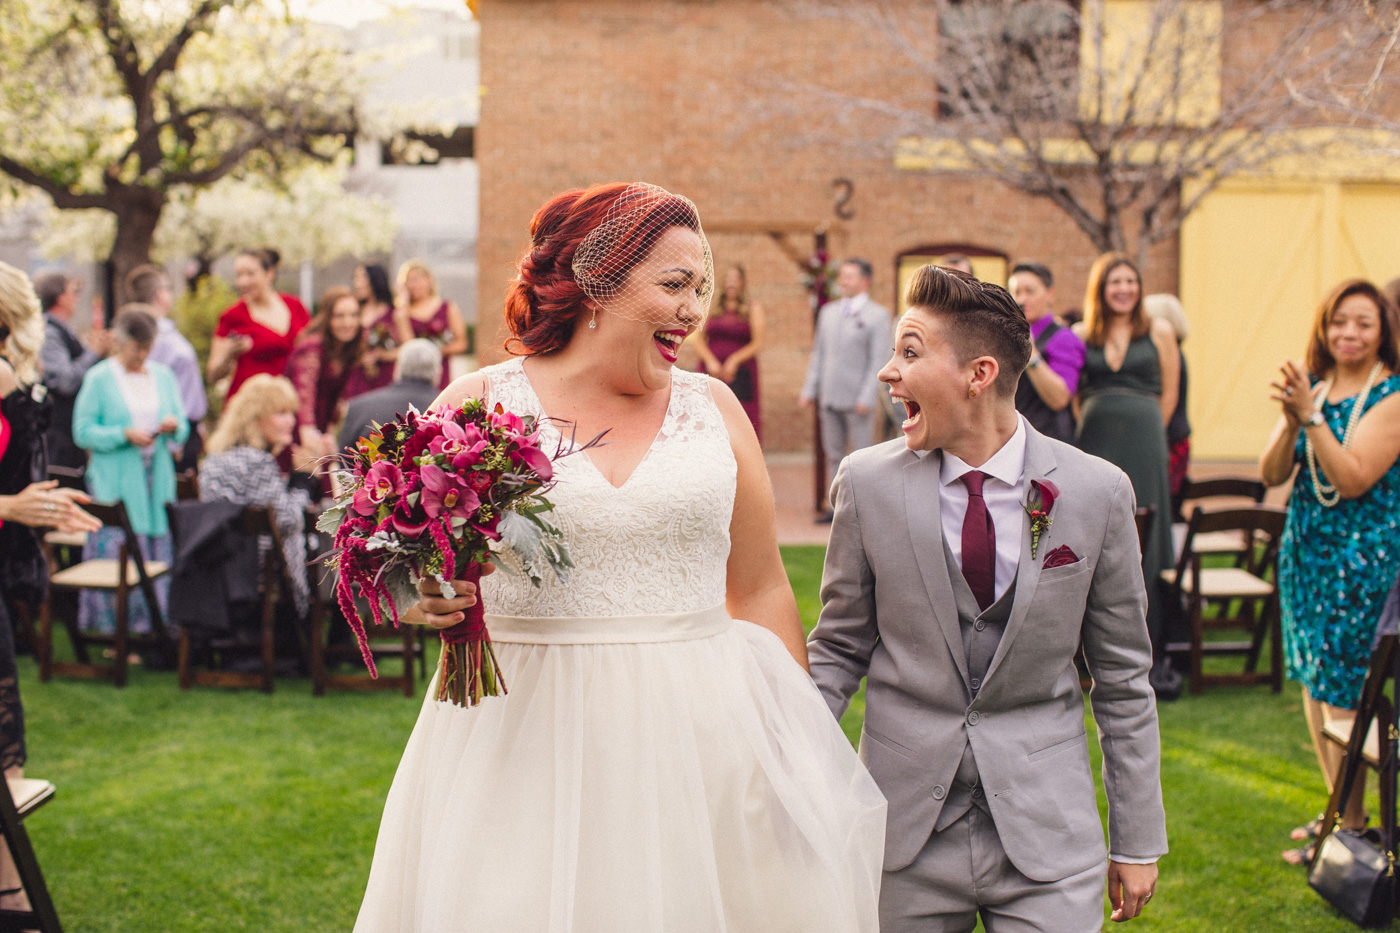 heritage-square-wedding-phoenix-aaron-kes-photography